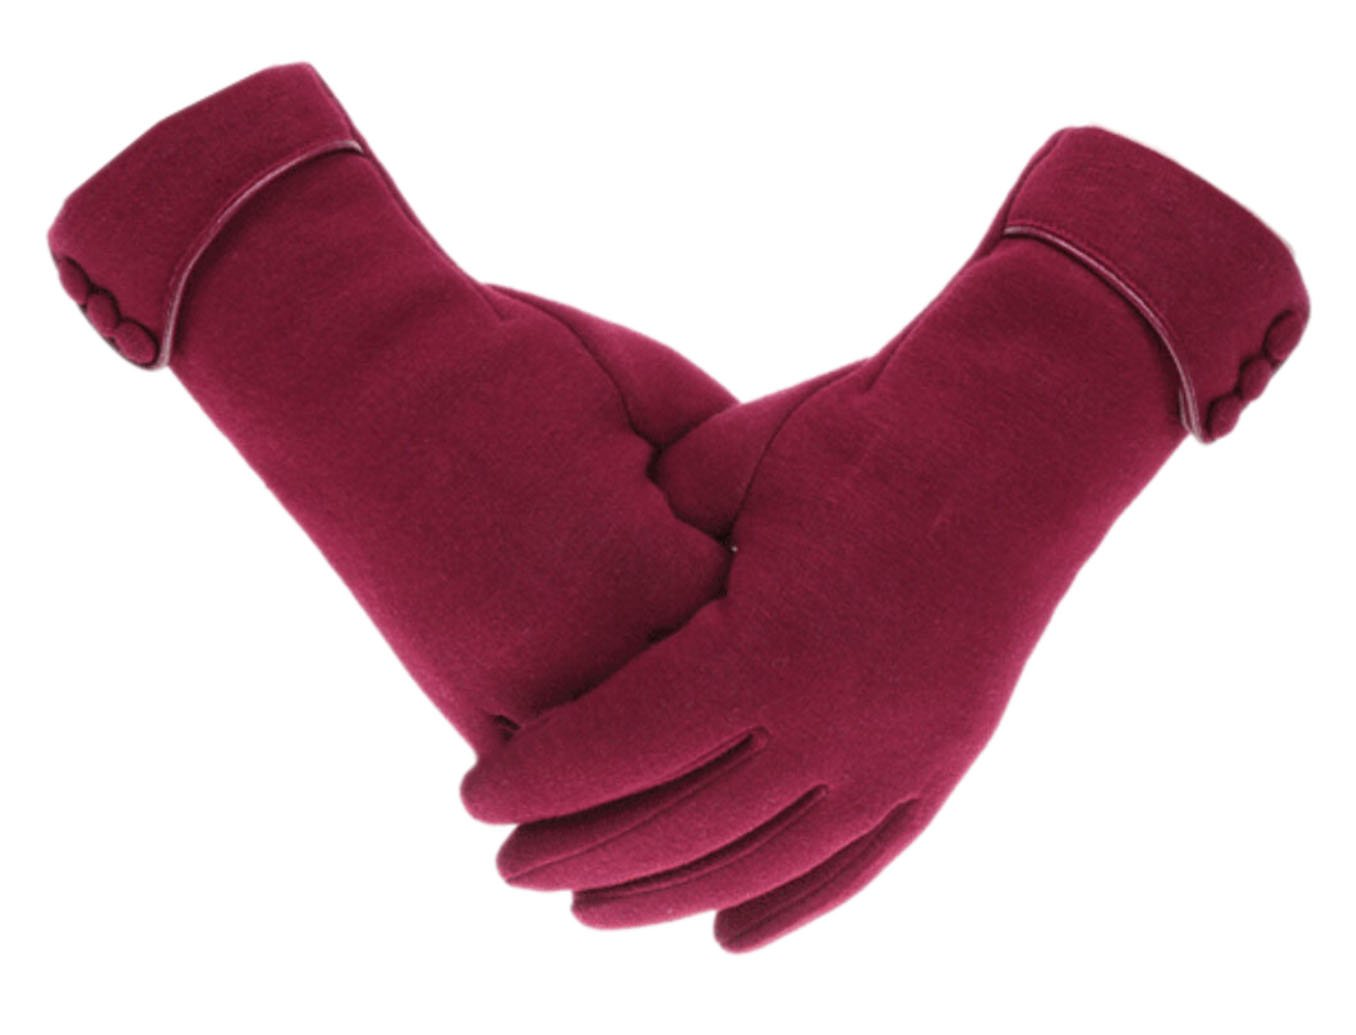 Tomily Womens Touch Screen Phone Fleece Windproof Gloves Winter Warm Wear (Wine Red)